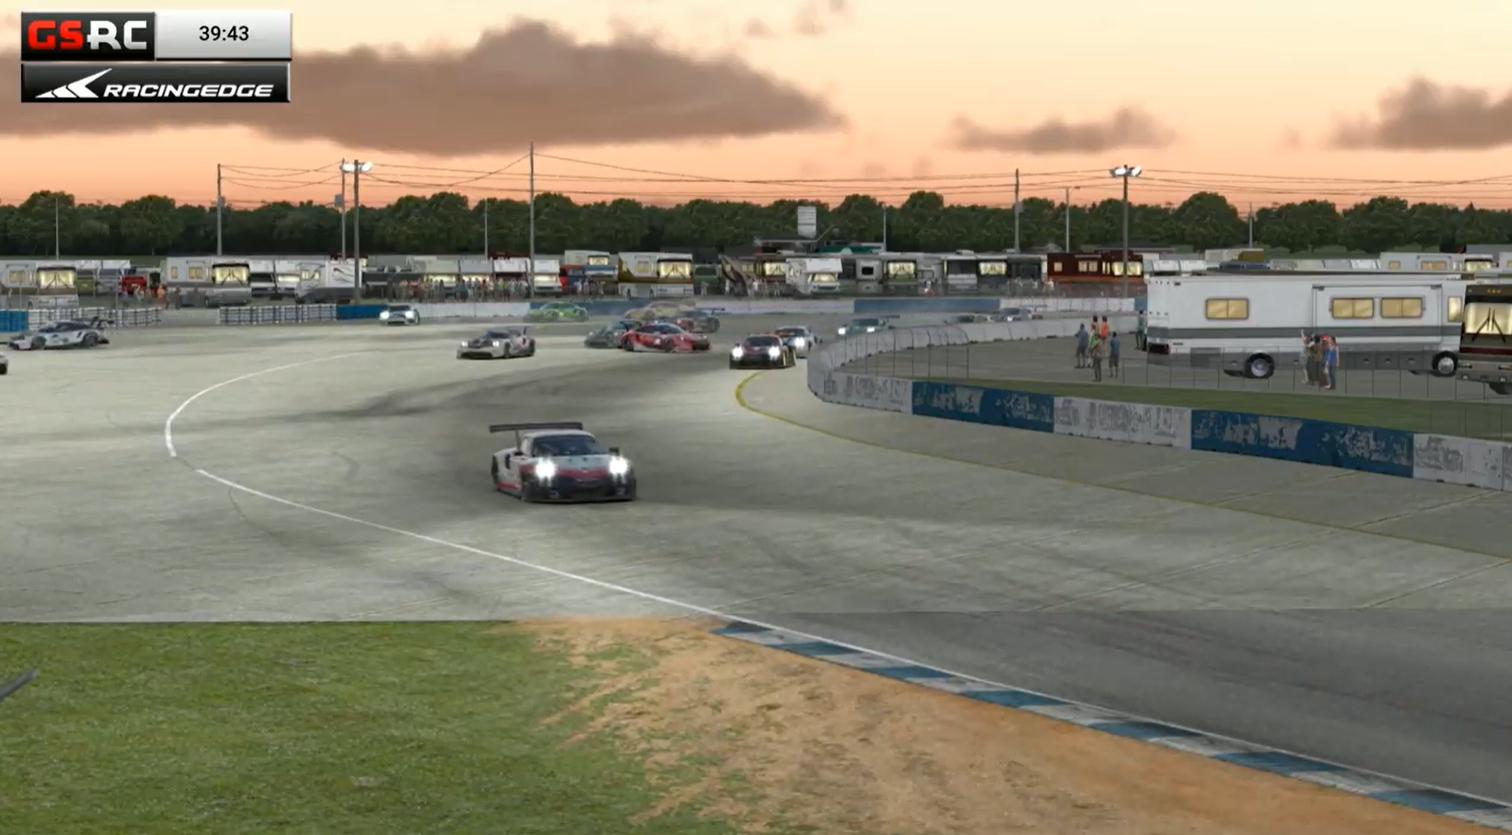 Racing Edge SimRacing Series: Season 2 continues with Sebring showstopper